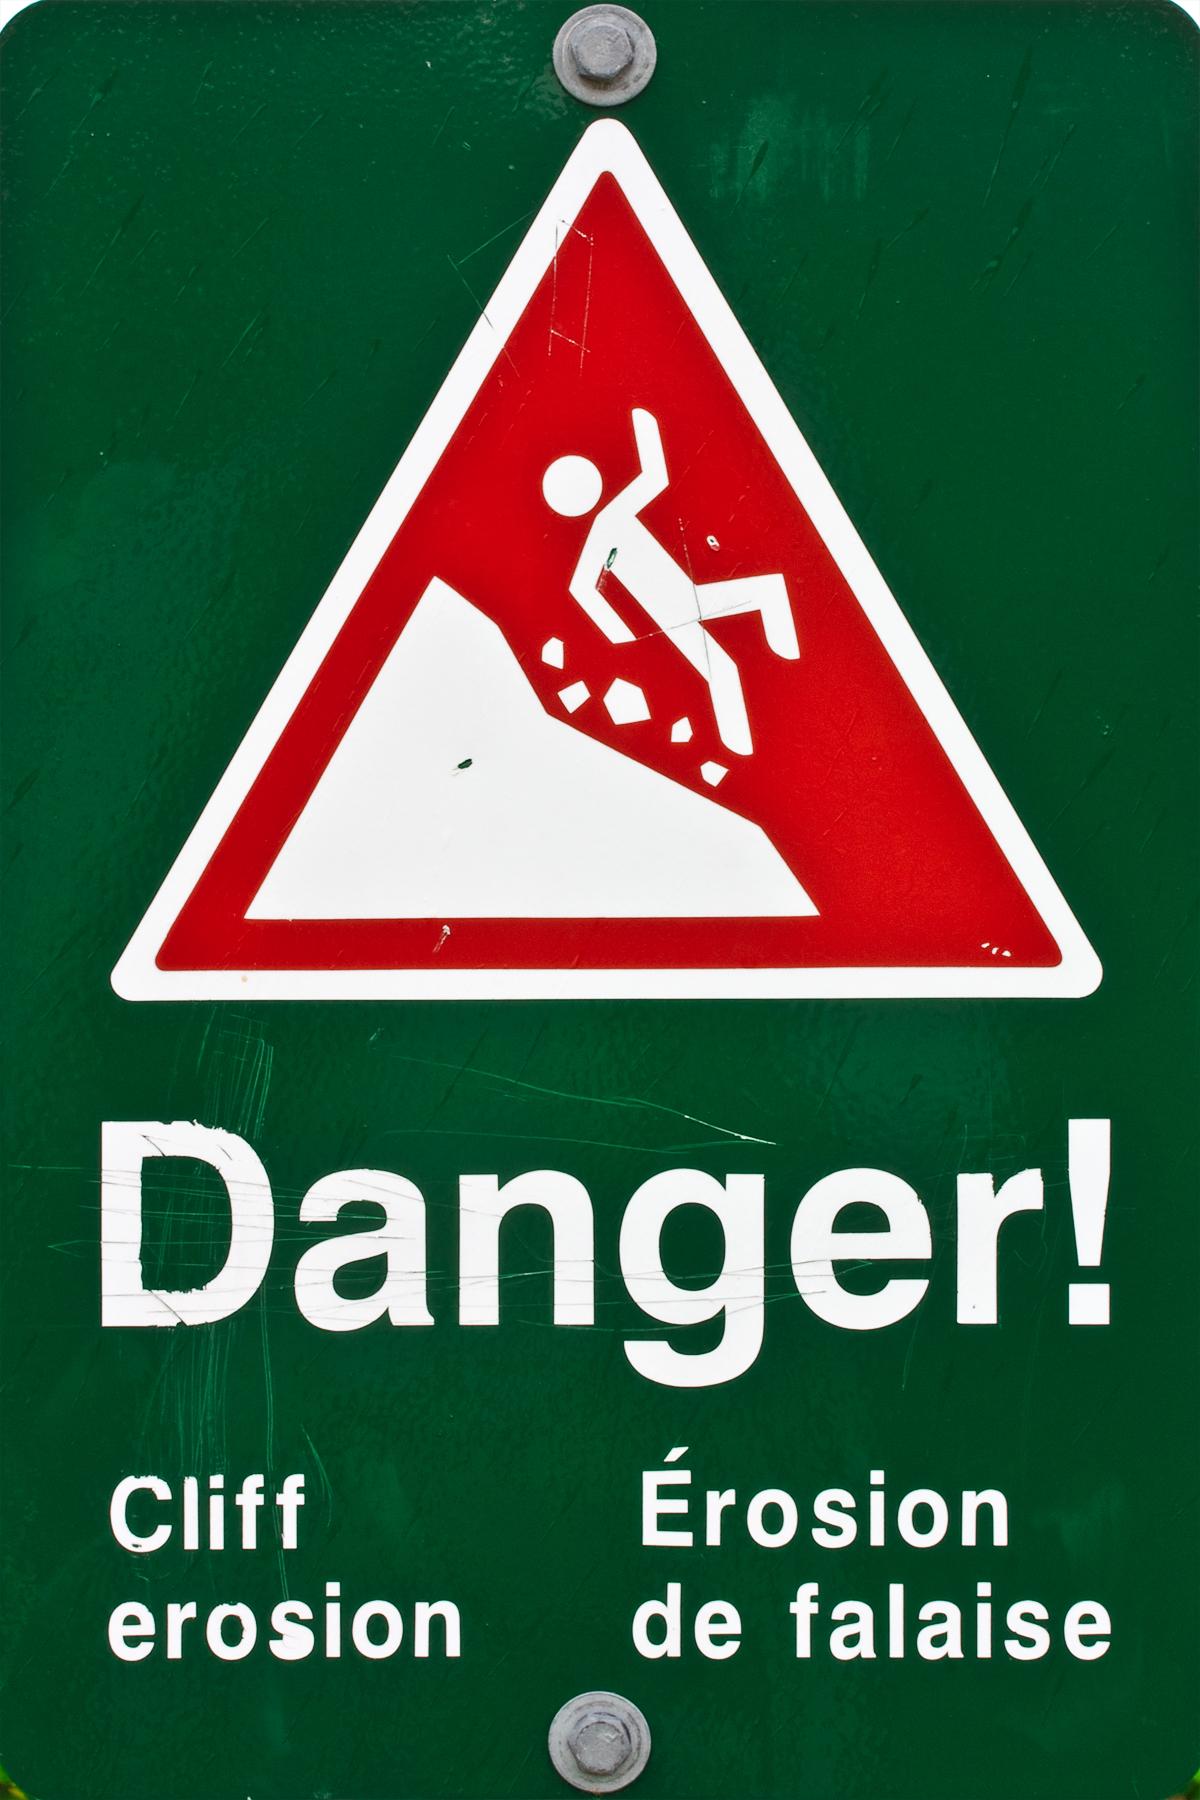 Cliff erosion warning sign photo